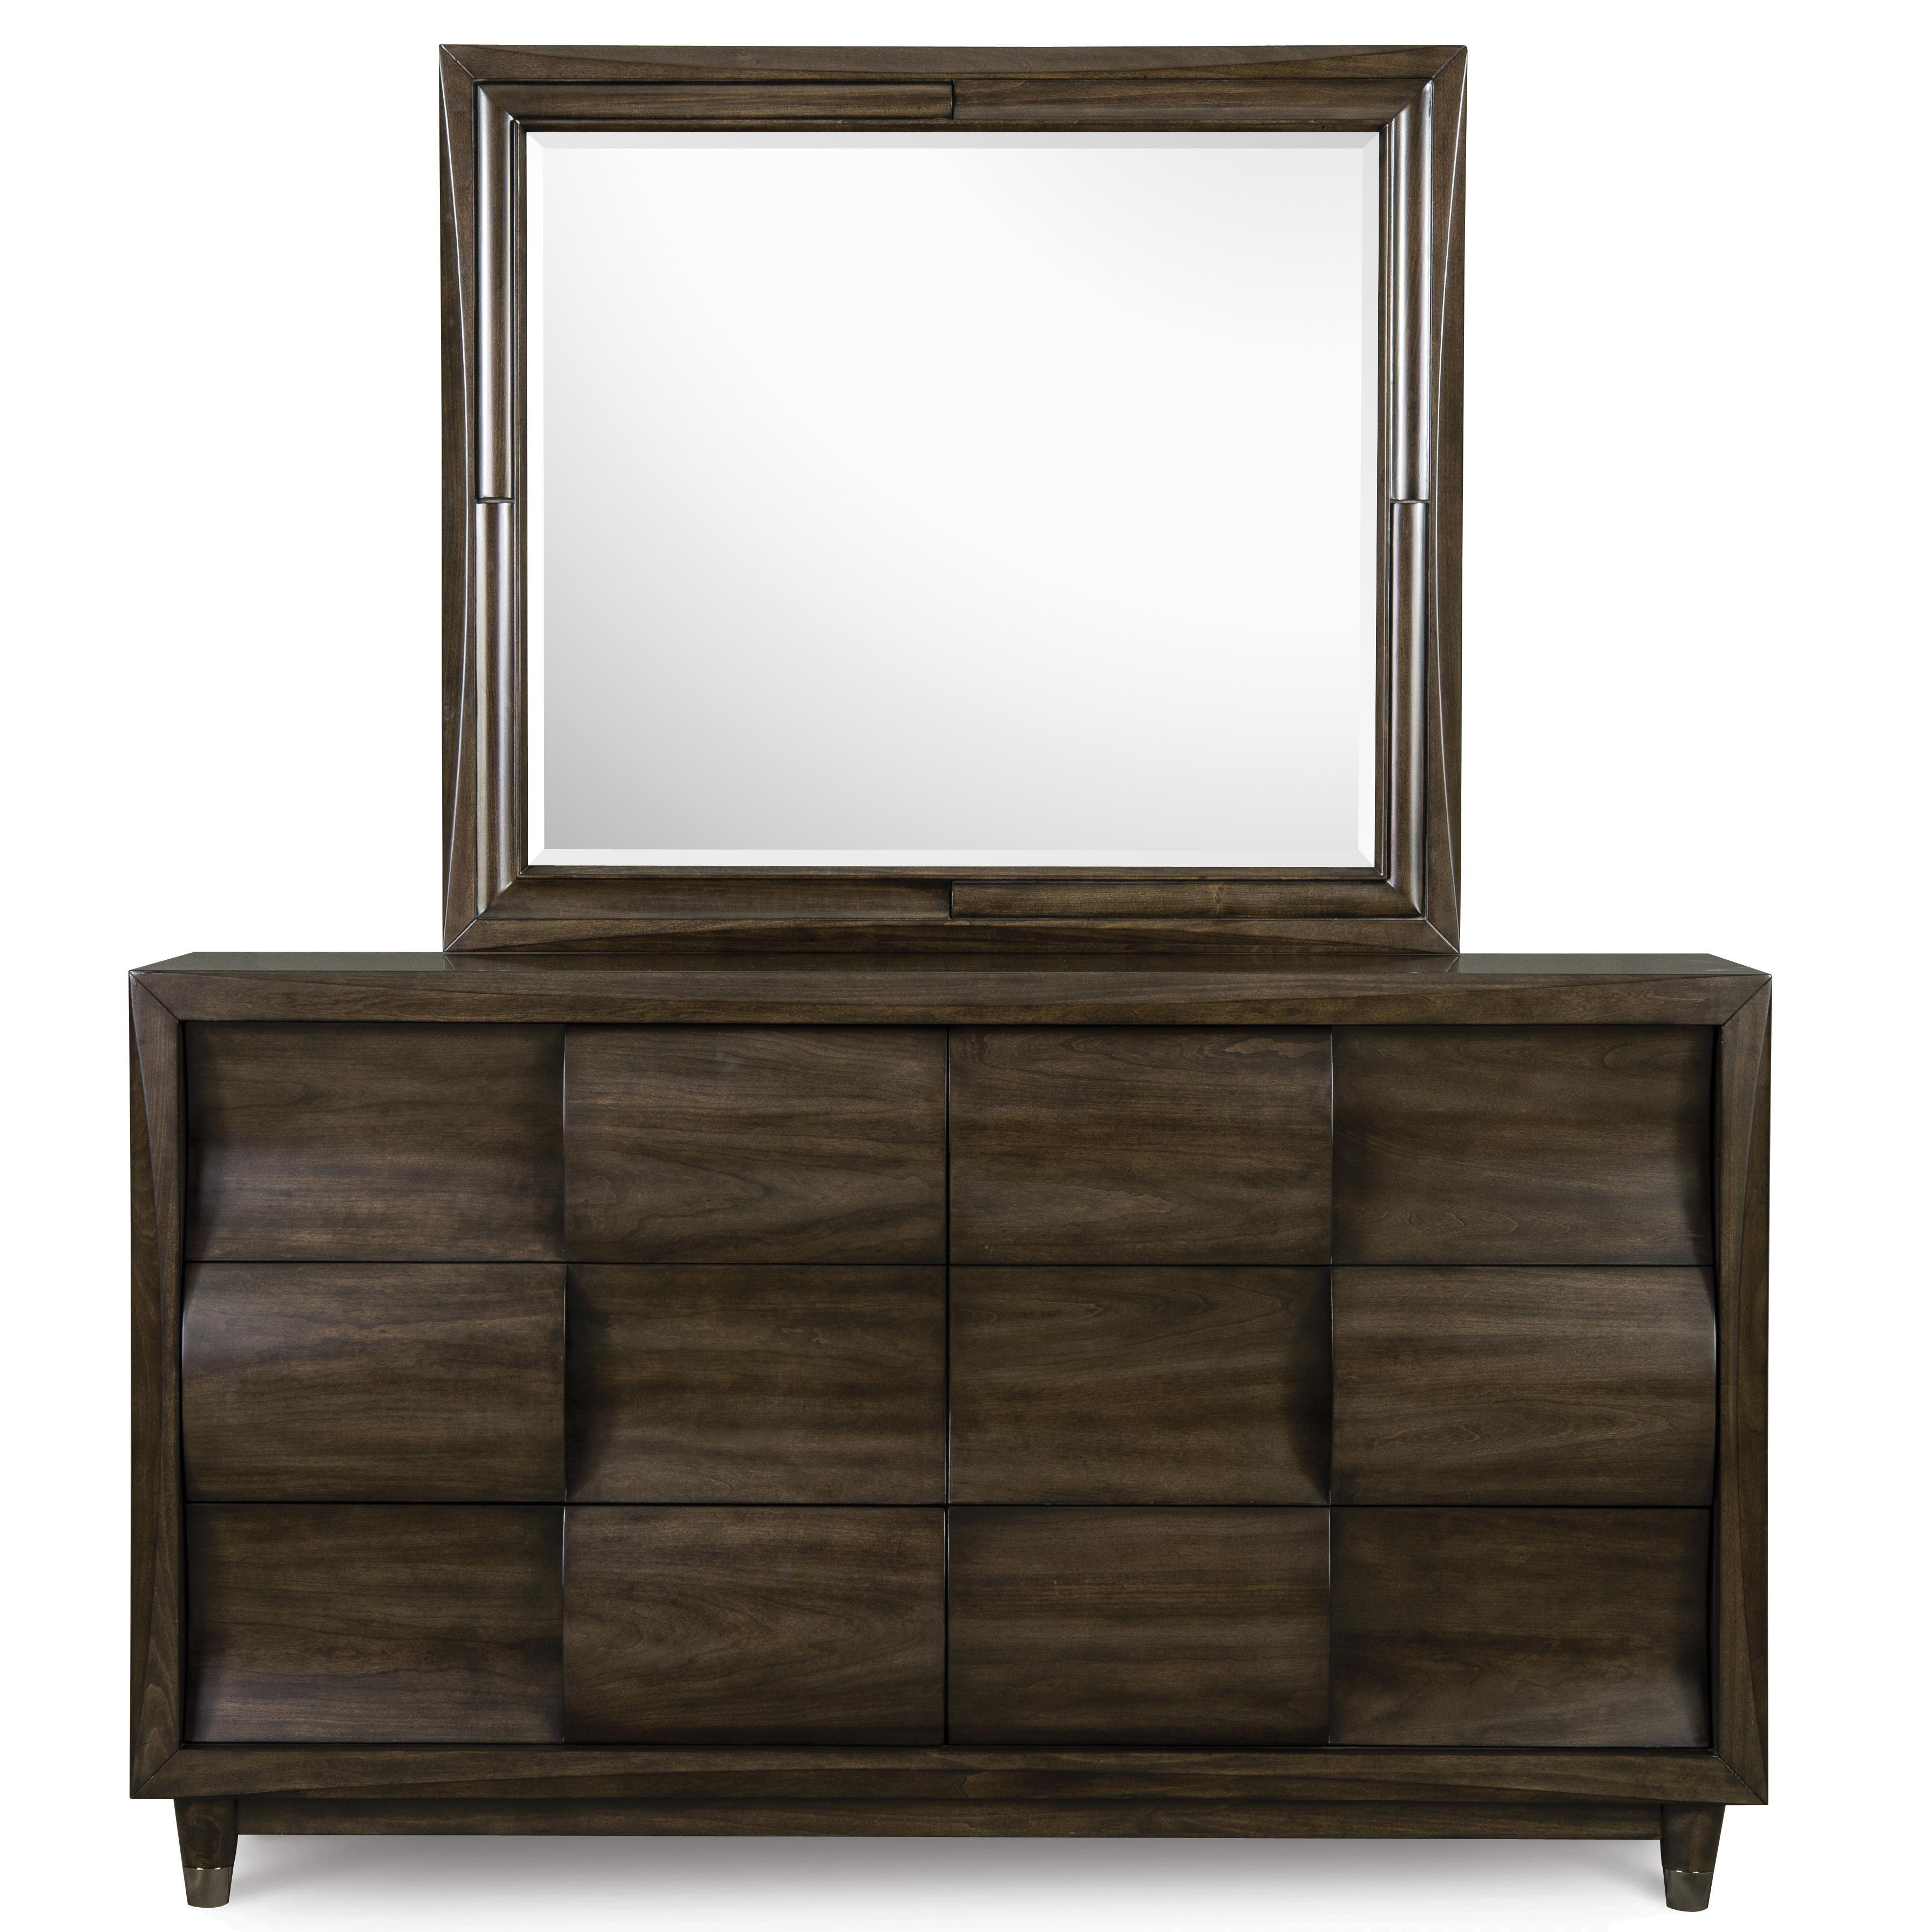 Magnussen Home Noma Dresser with Mirror - Item Number: B2640-20+40